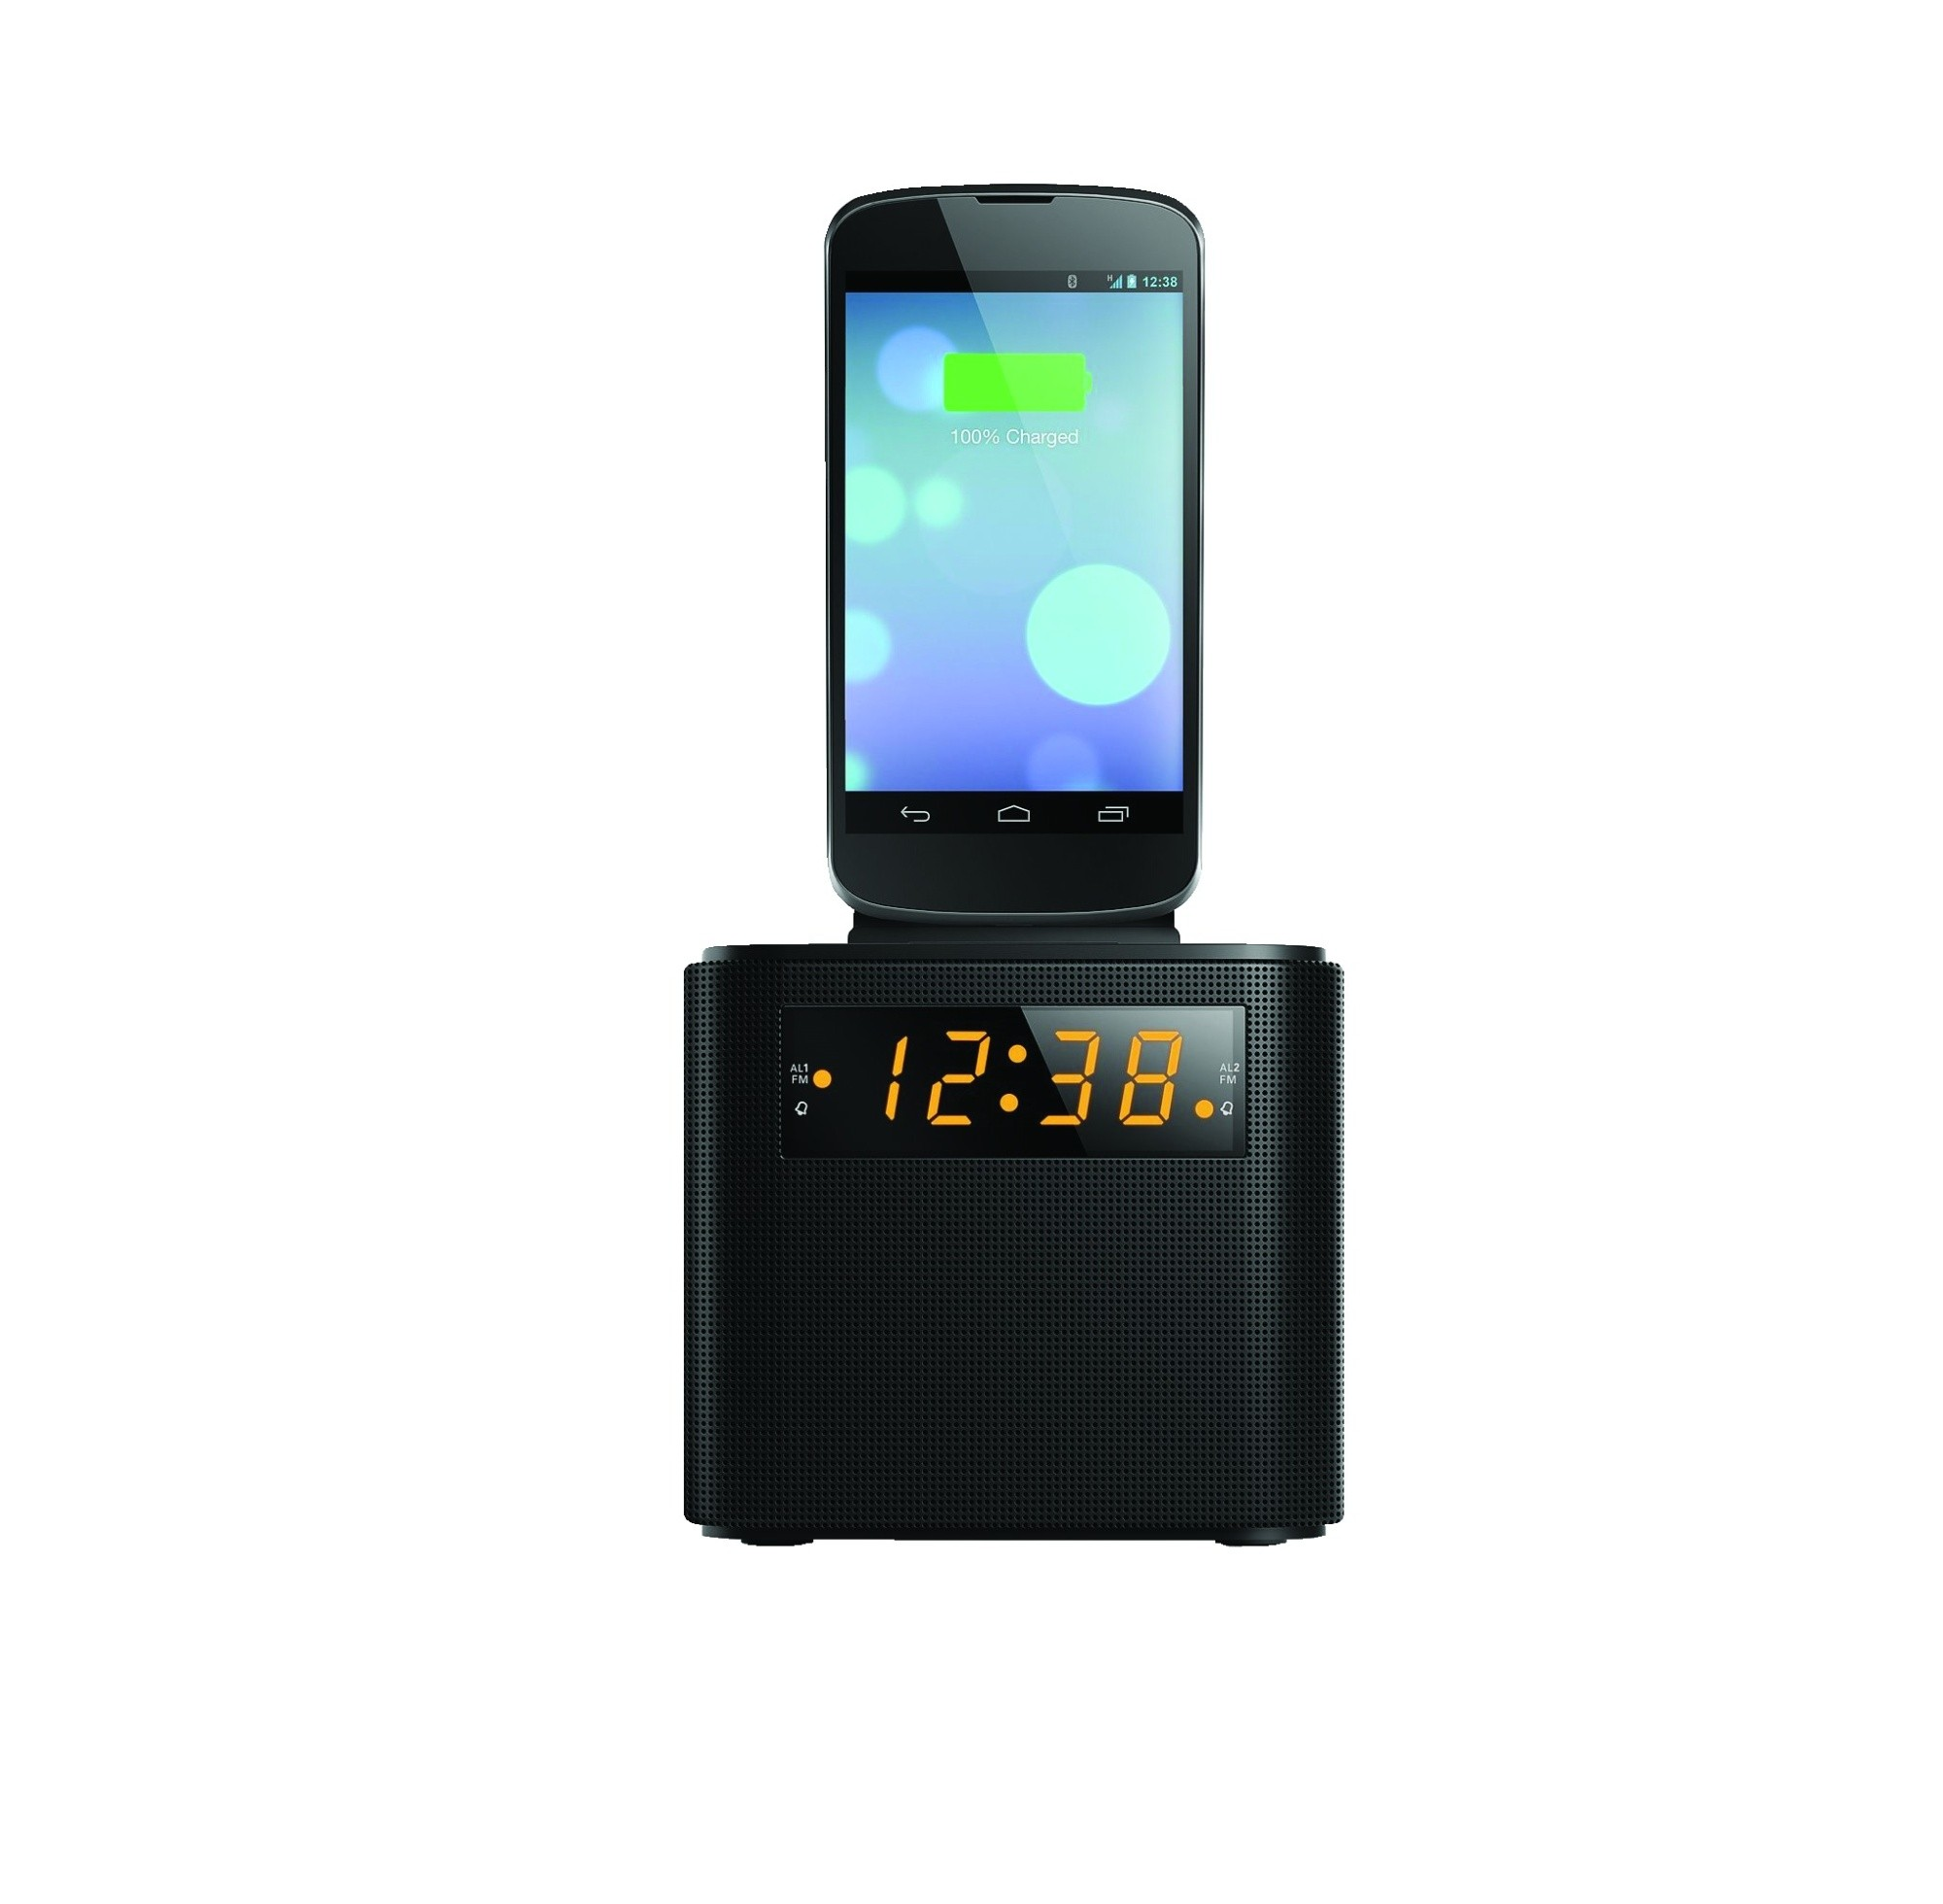 philips aj3200 05 fm clock radio with phone dock digital screen alarm speaker ebay. Black Bedroom Furniture Sets. Home Design Ideas